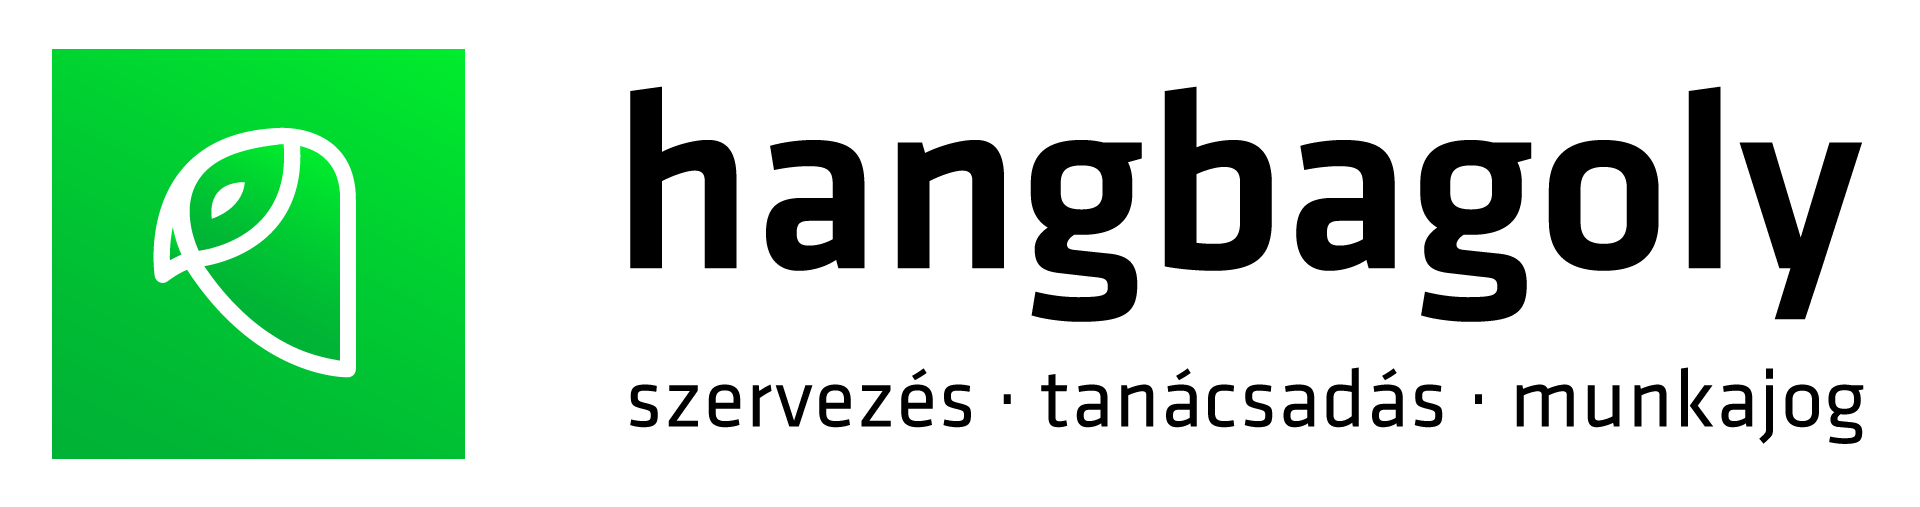 Hangbagoly